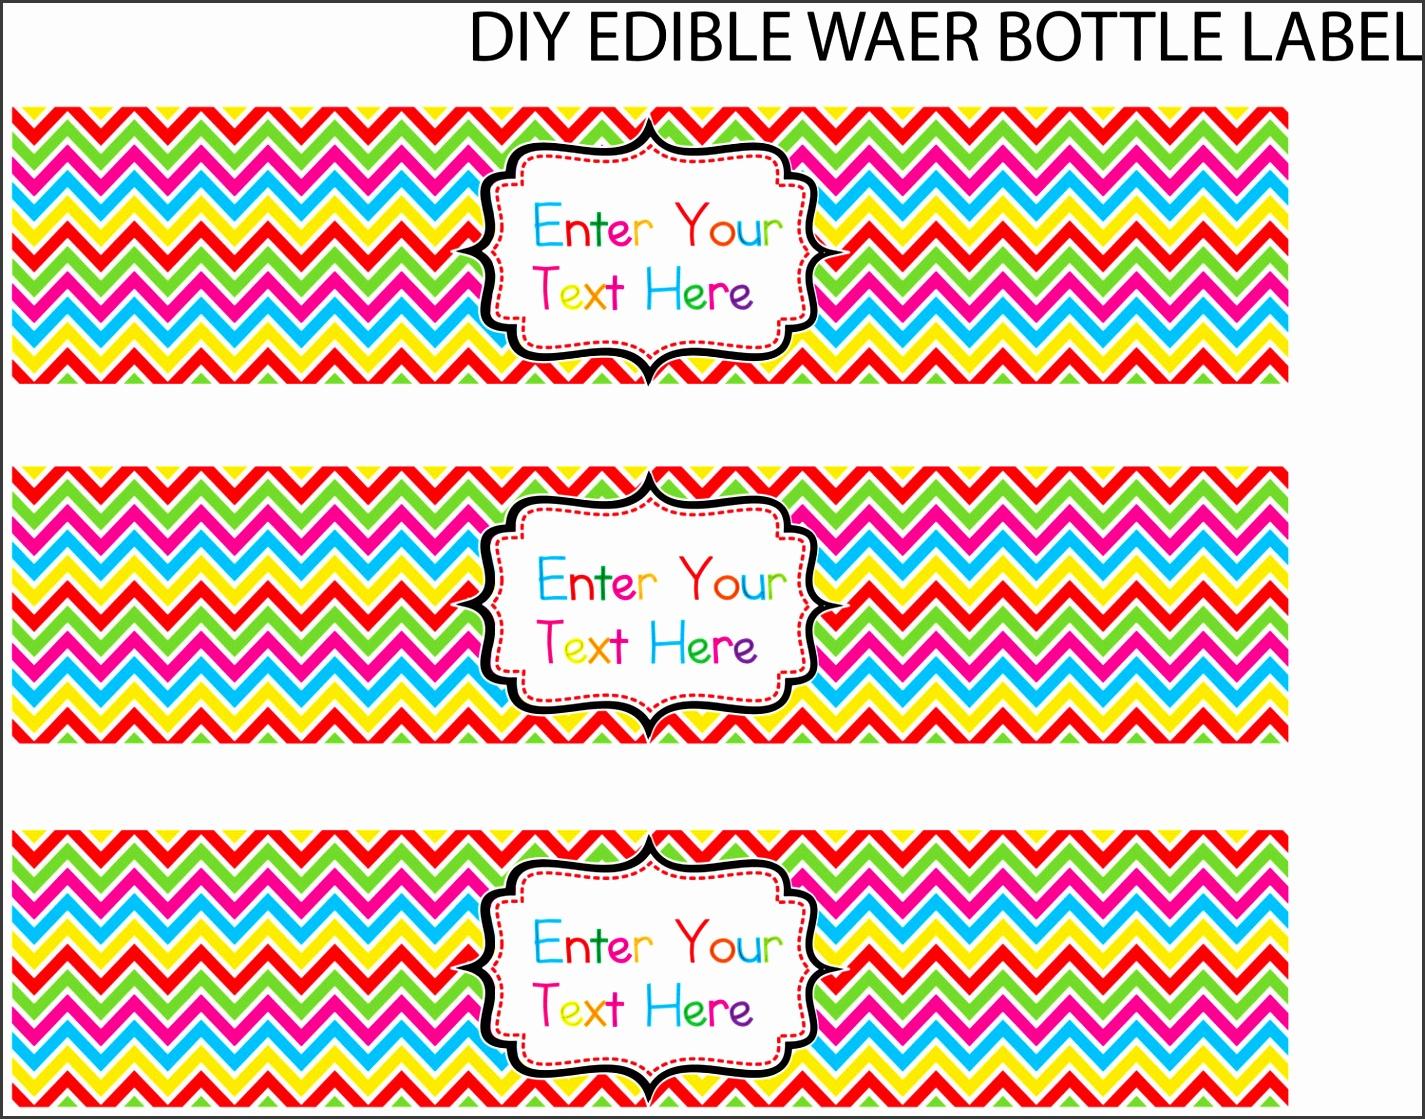 water bottle label template free word